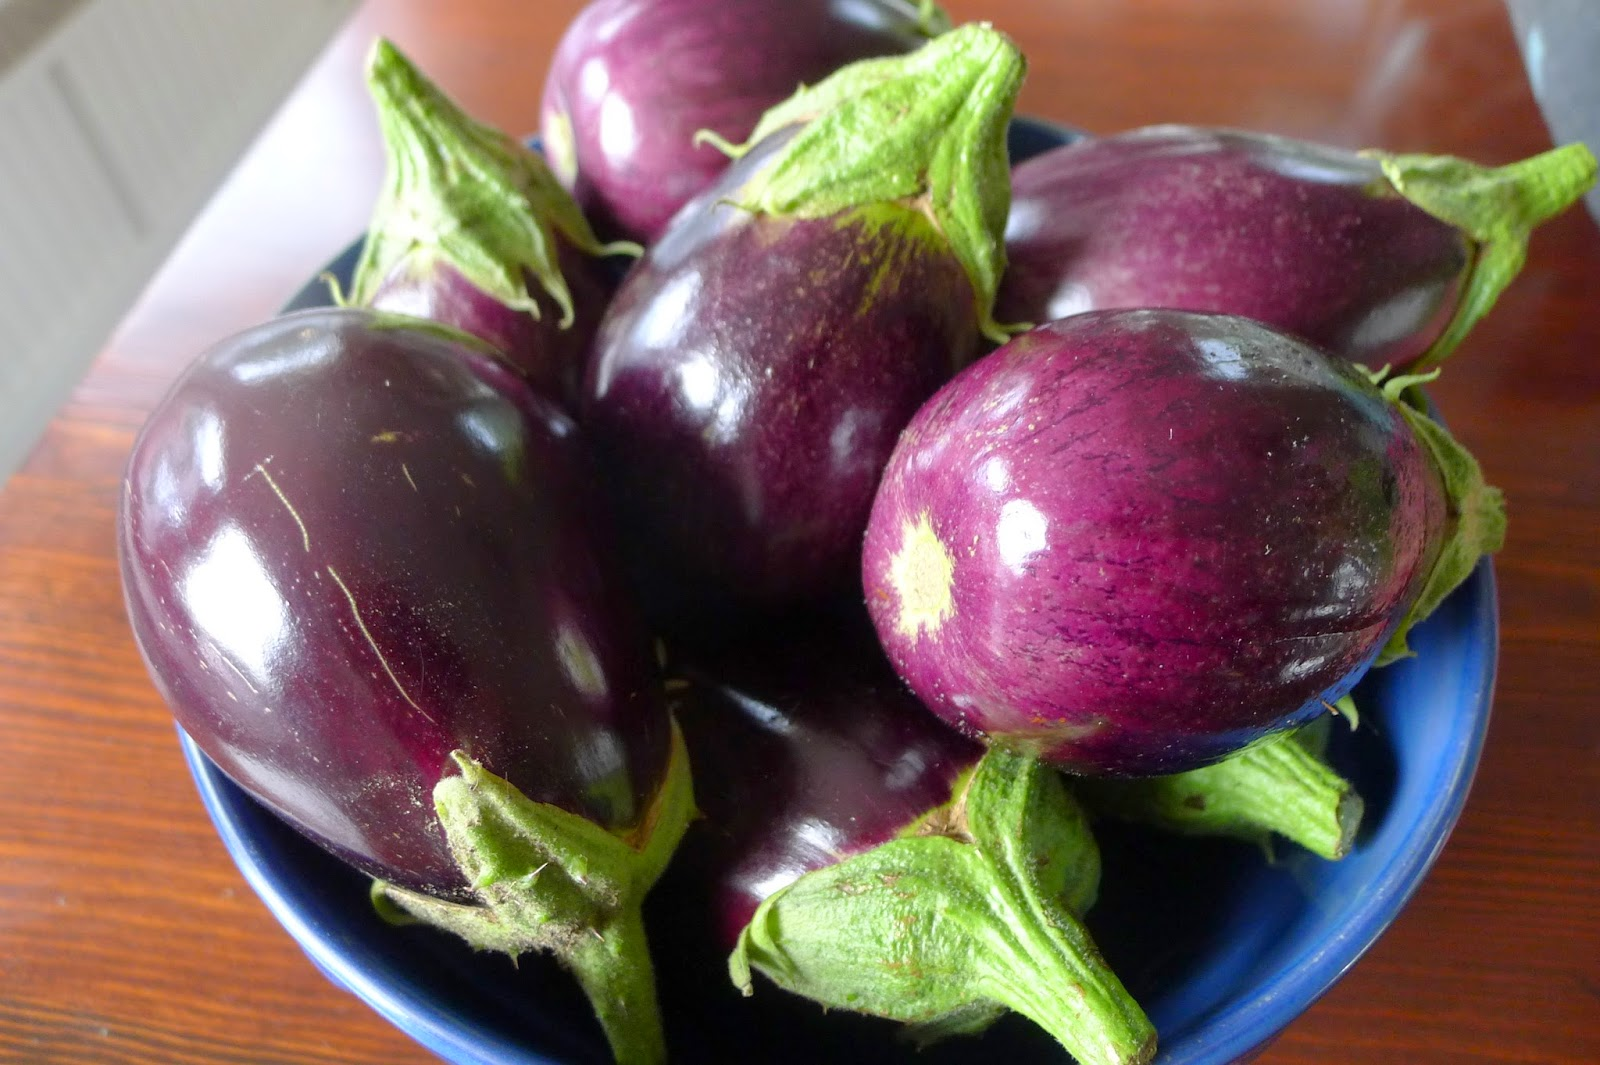 Preserving eggplant